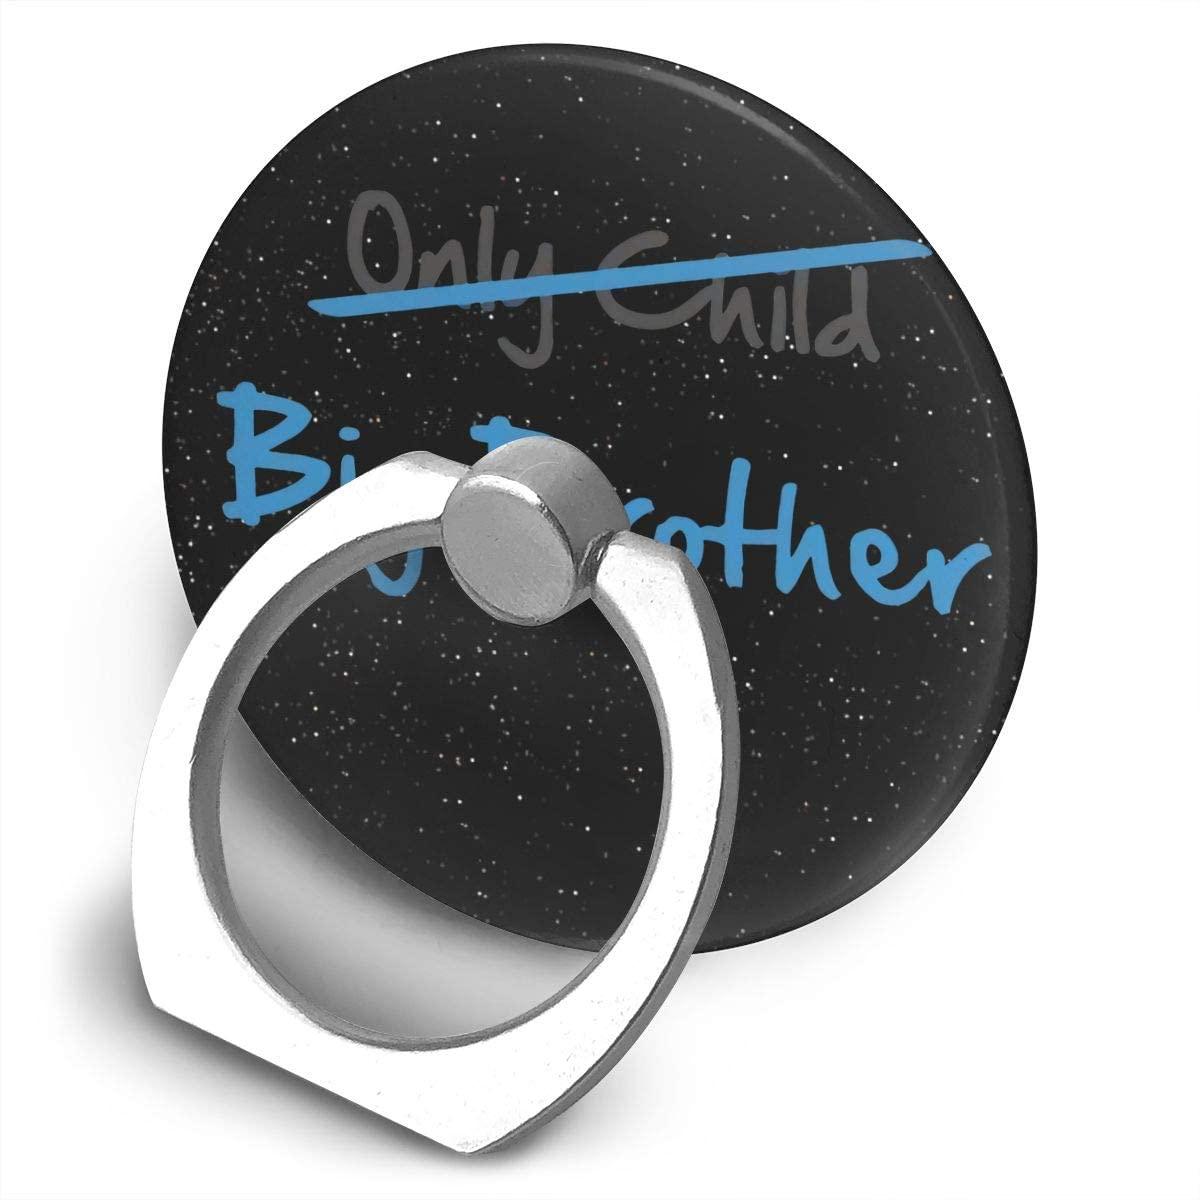 Heyuchuan Big Brother Finally 360 Degree Rotating Ring Stand Grip Mounts